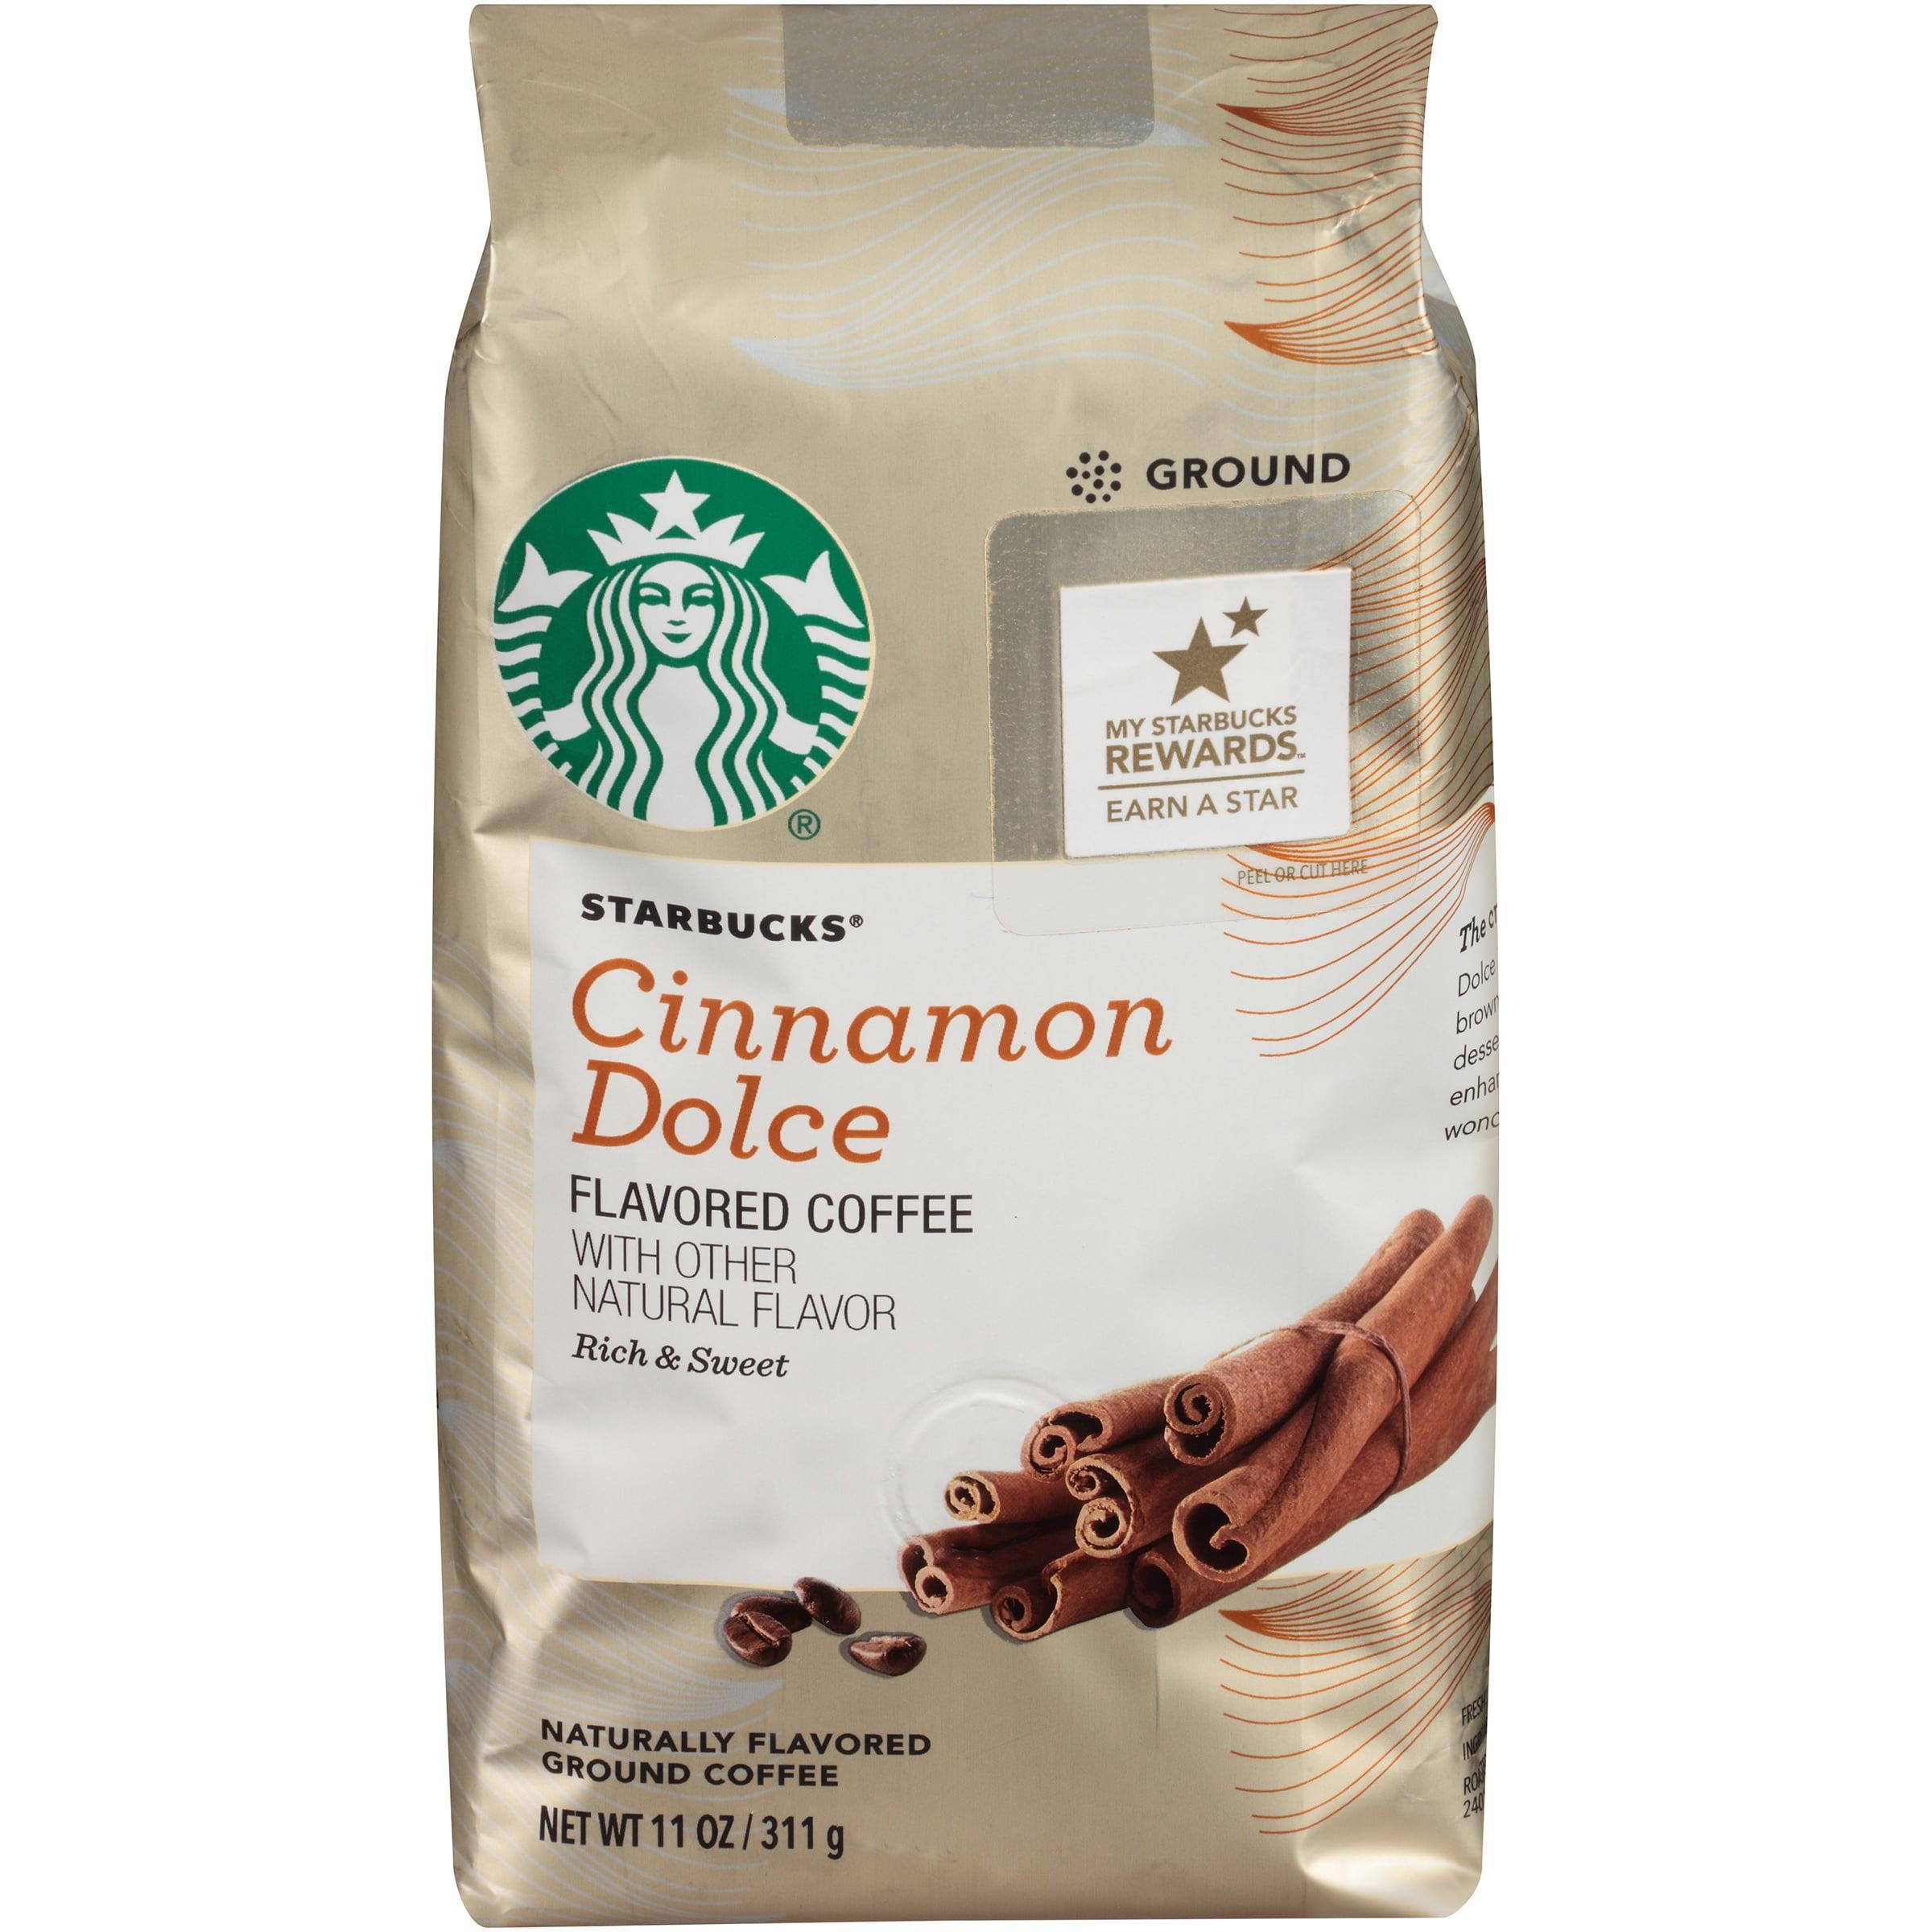 Starbucks Cinnamon Dolce Coffee